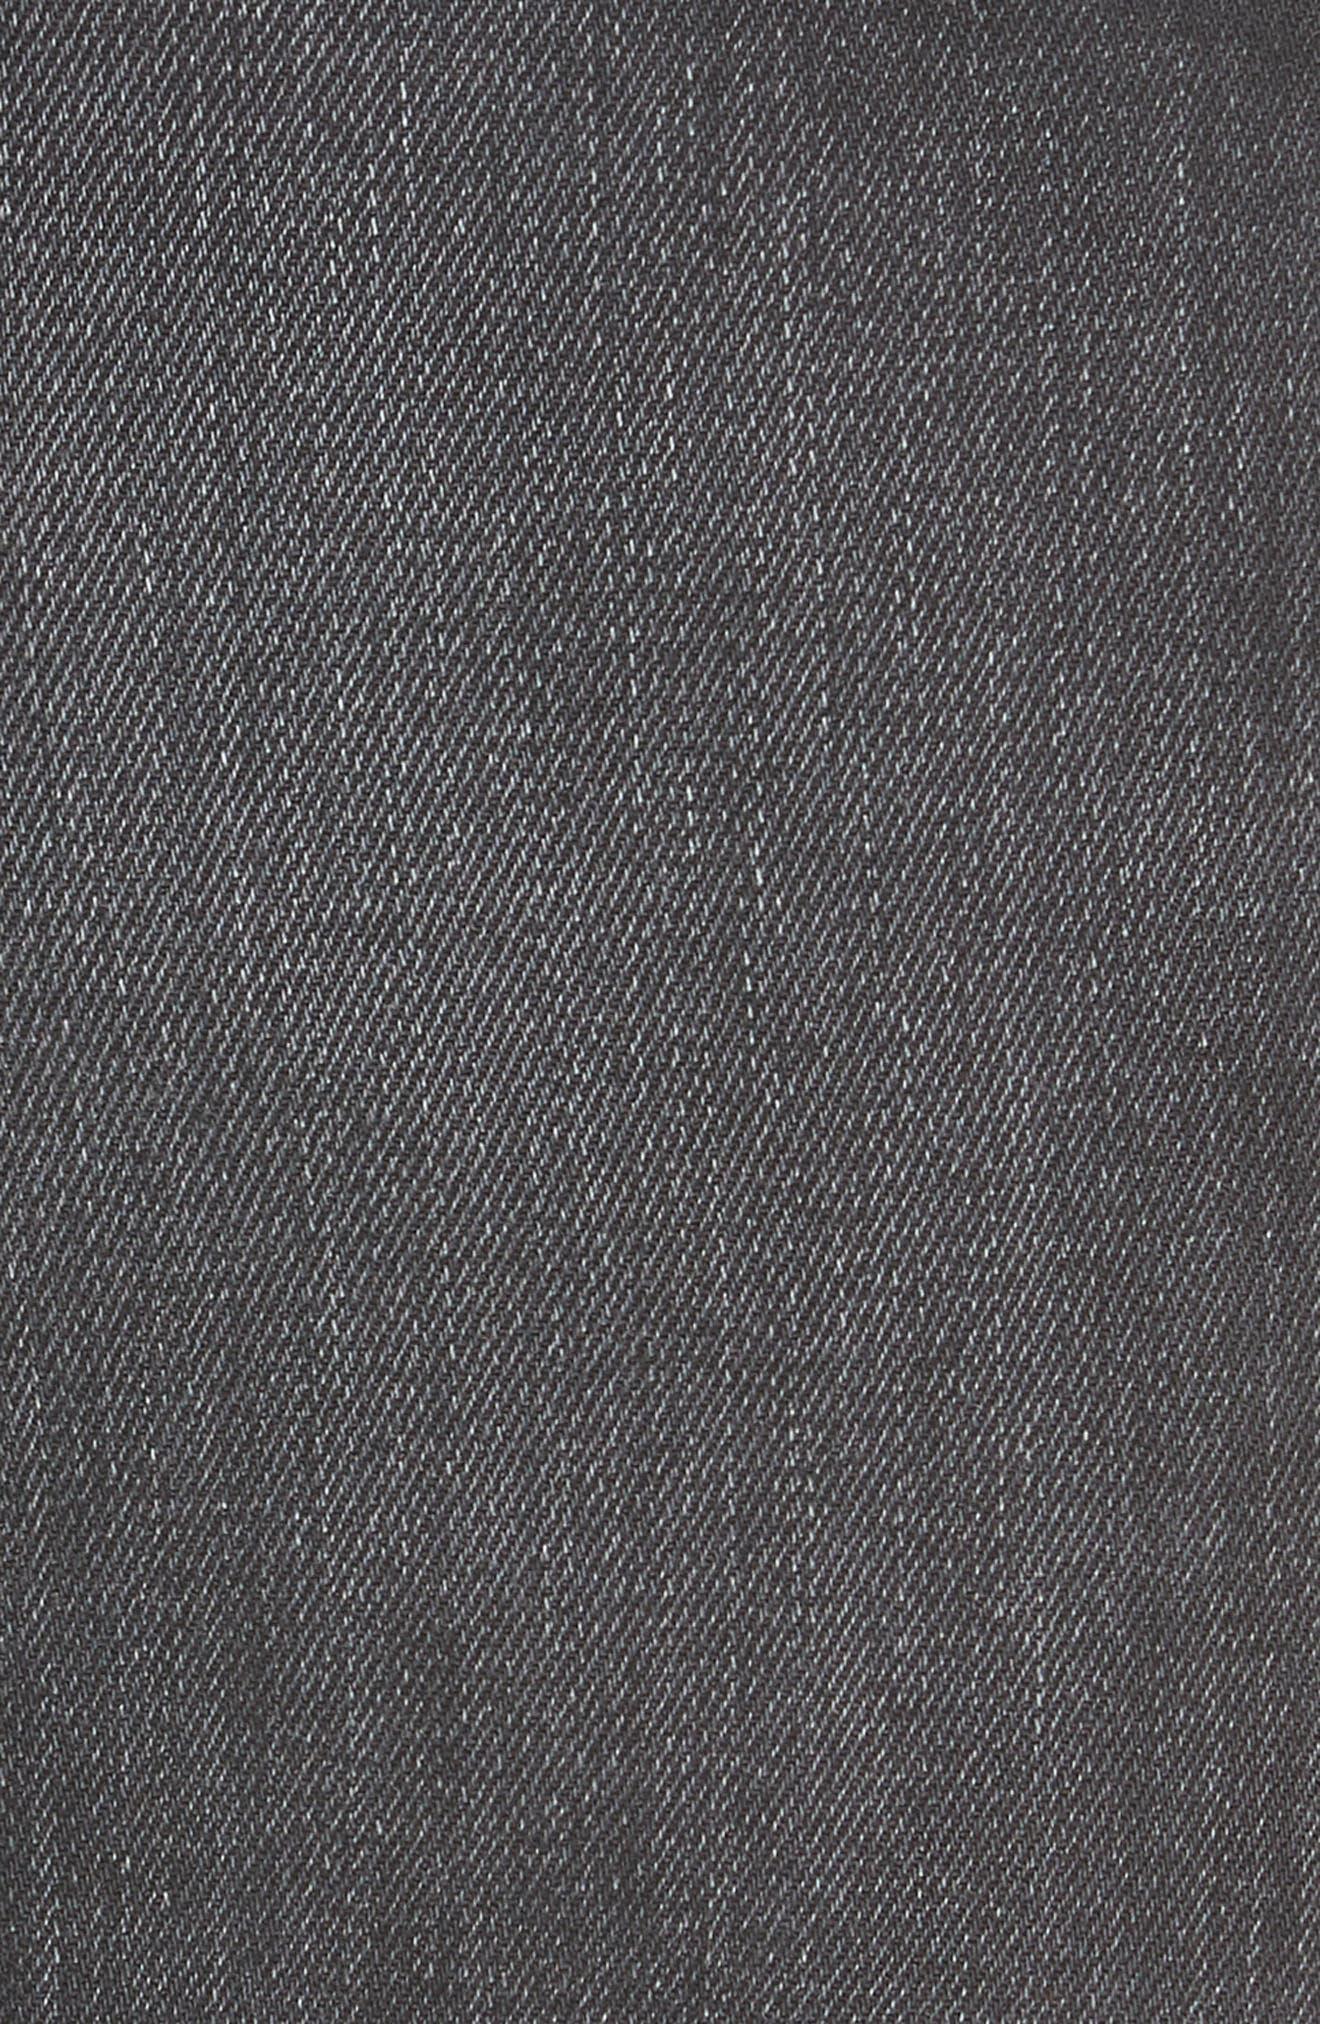 NILI LOTAN, Wade Lace-Up Wide Leg Jeans, Alternate thumbnail 6, color, VINTAGE BLACK